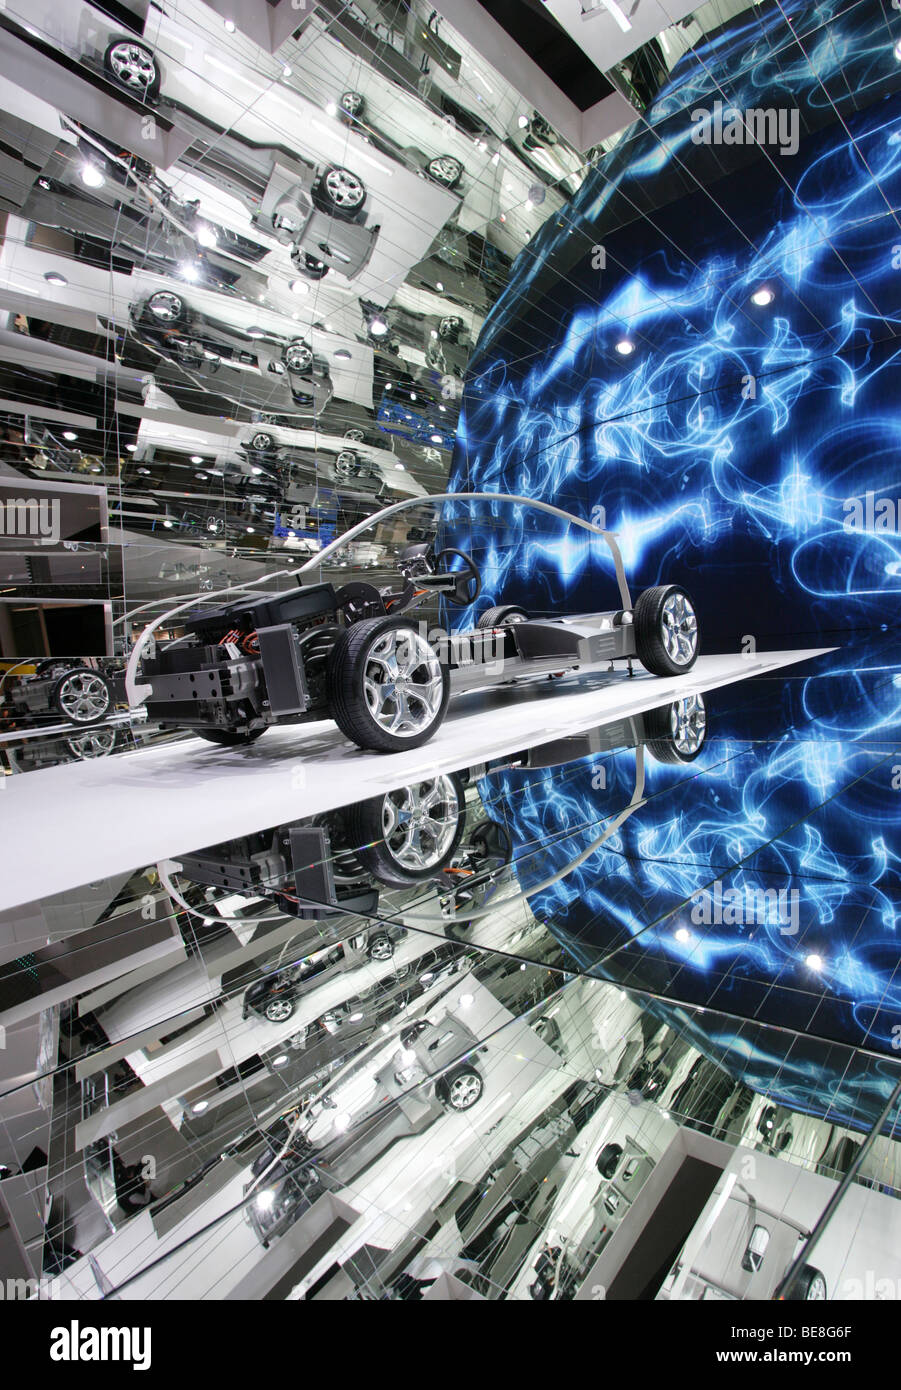 electric car Opel Ampera at the 63. IAA Motor Show in Frankfurt/Germany, 15.9.2009 - Stock Image